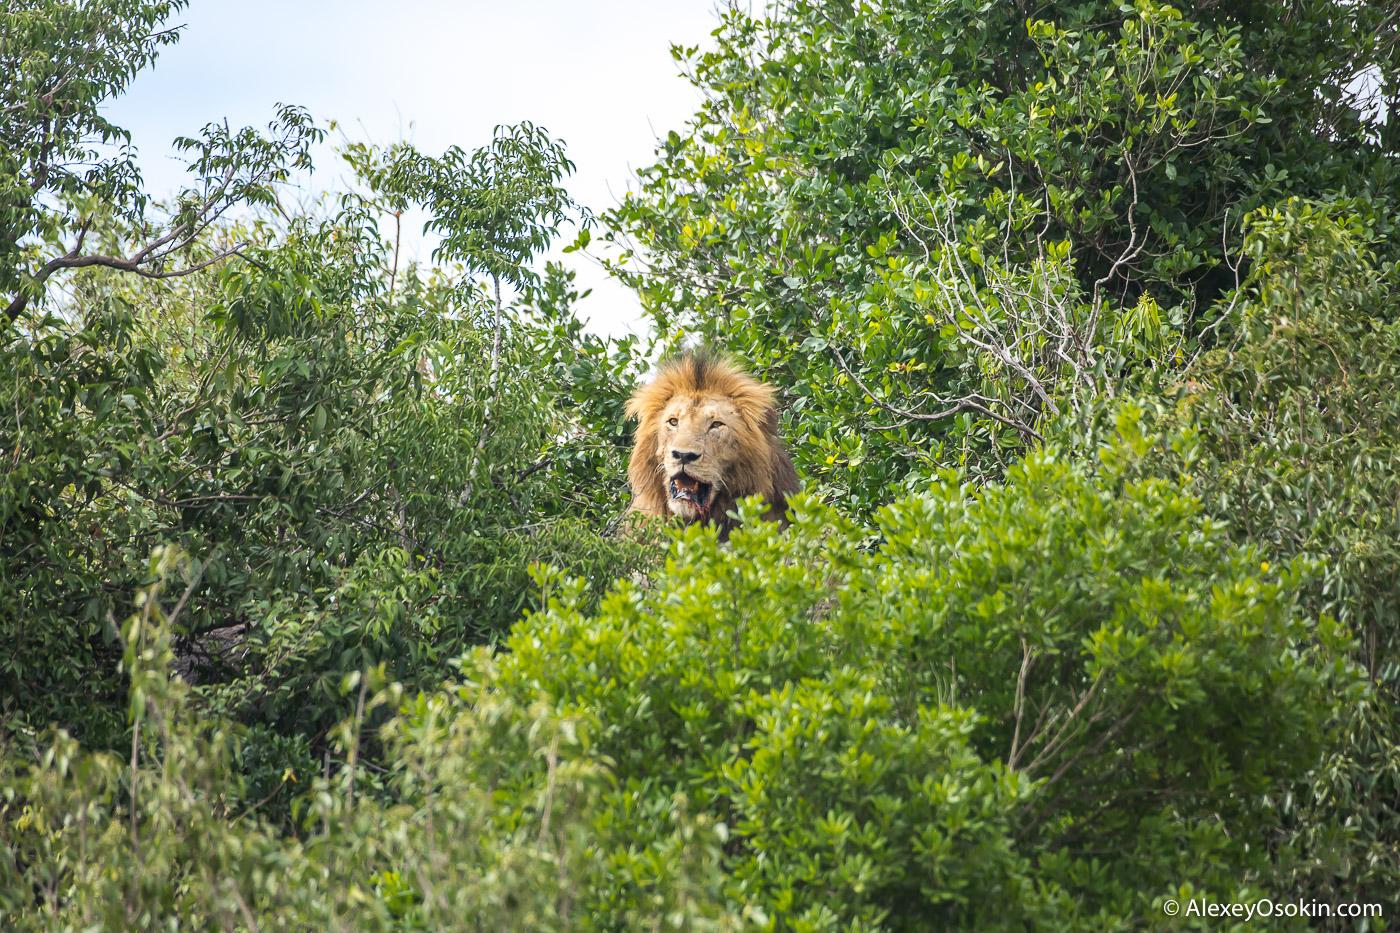 lions_kenya _2015_ao.jpg